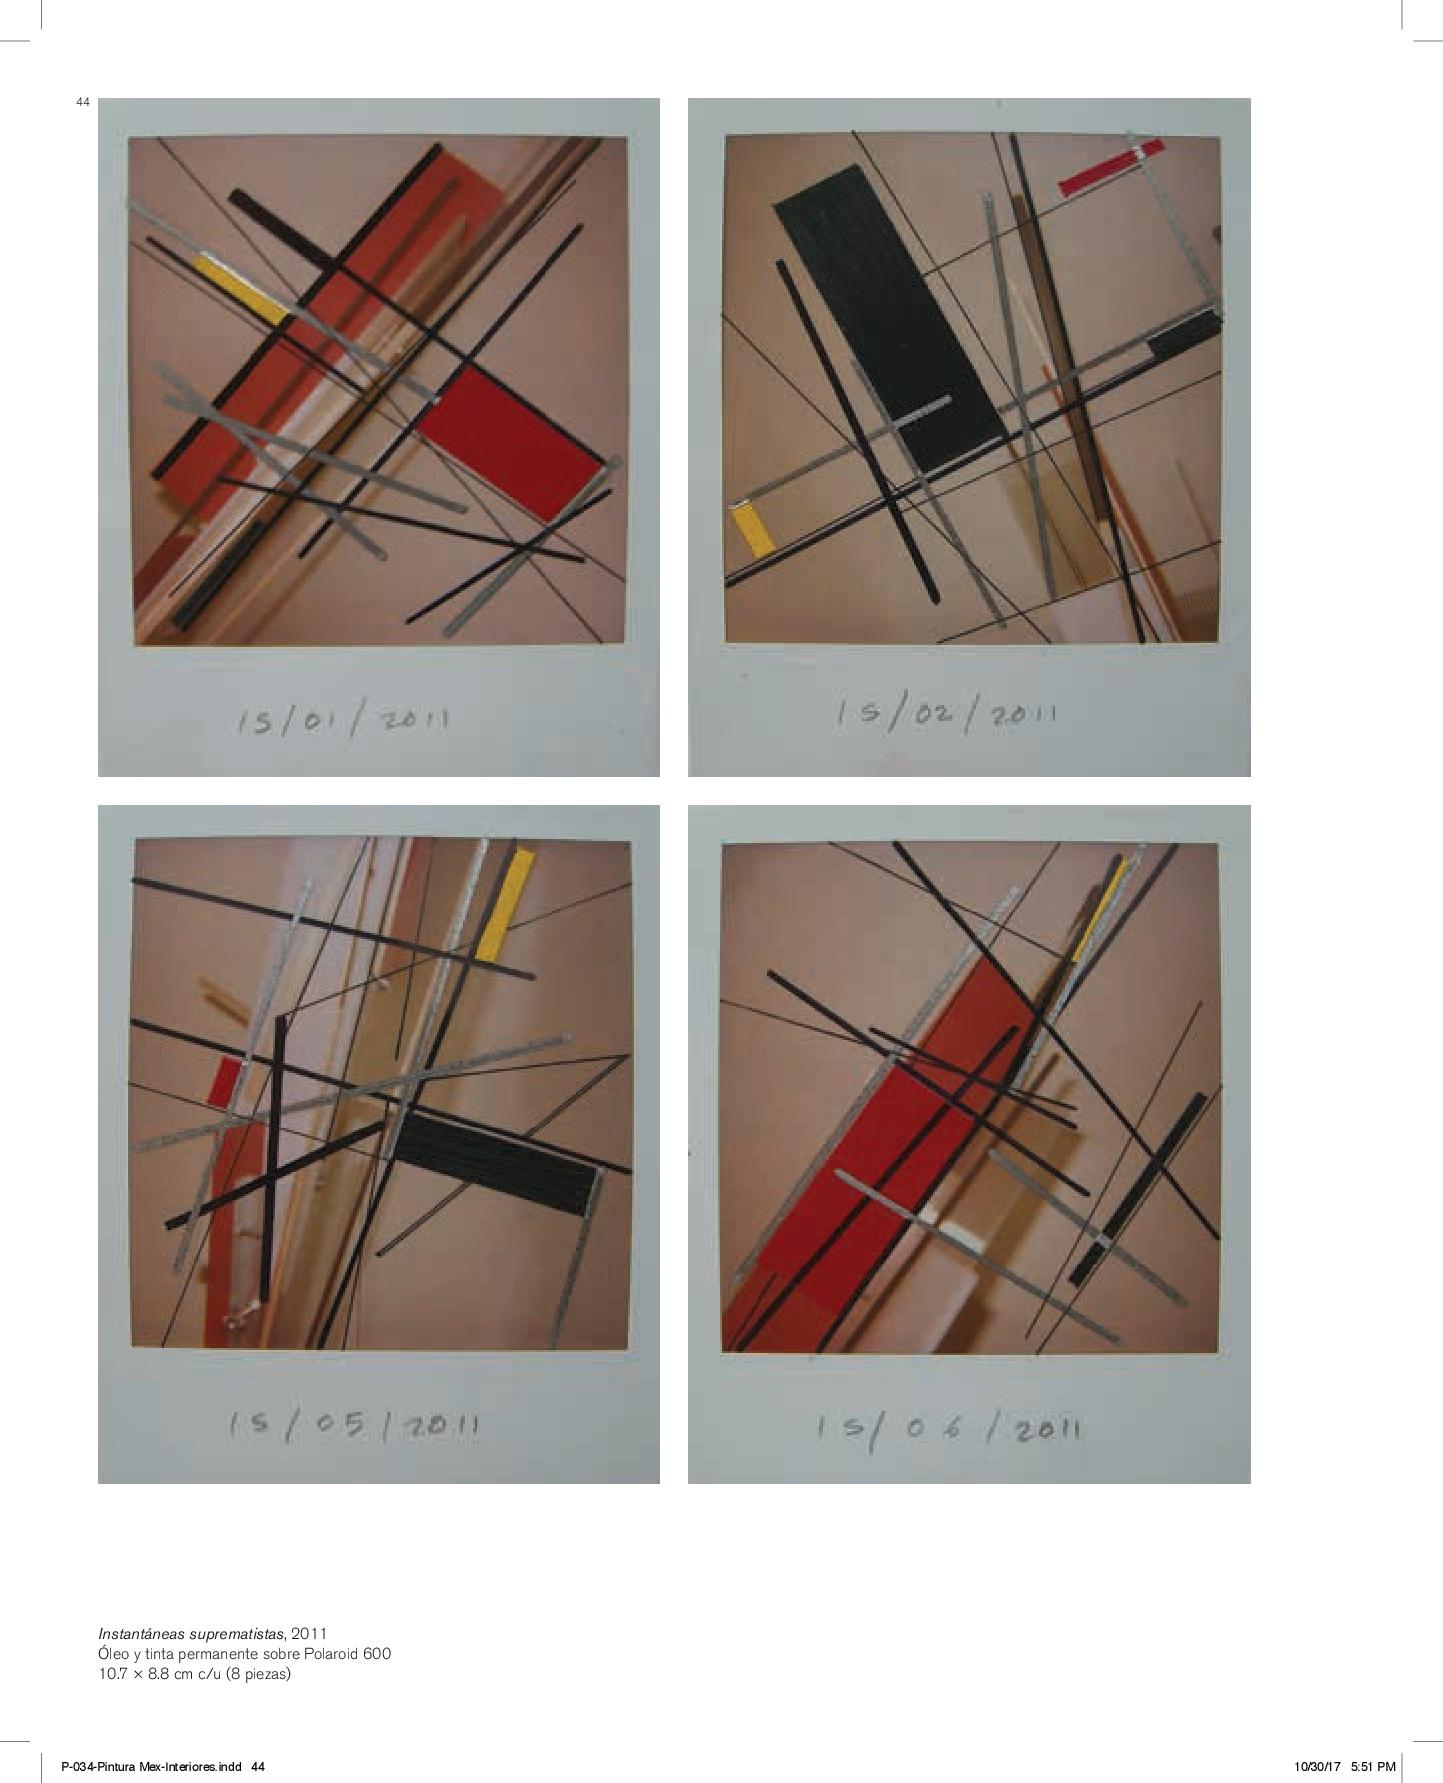 P-034-Pintura-Mex-Interiores-L04-3-044.jpg